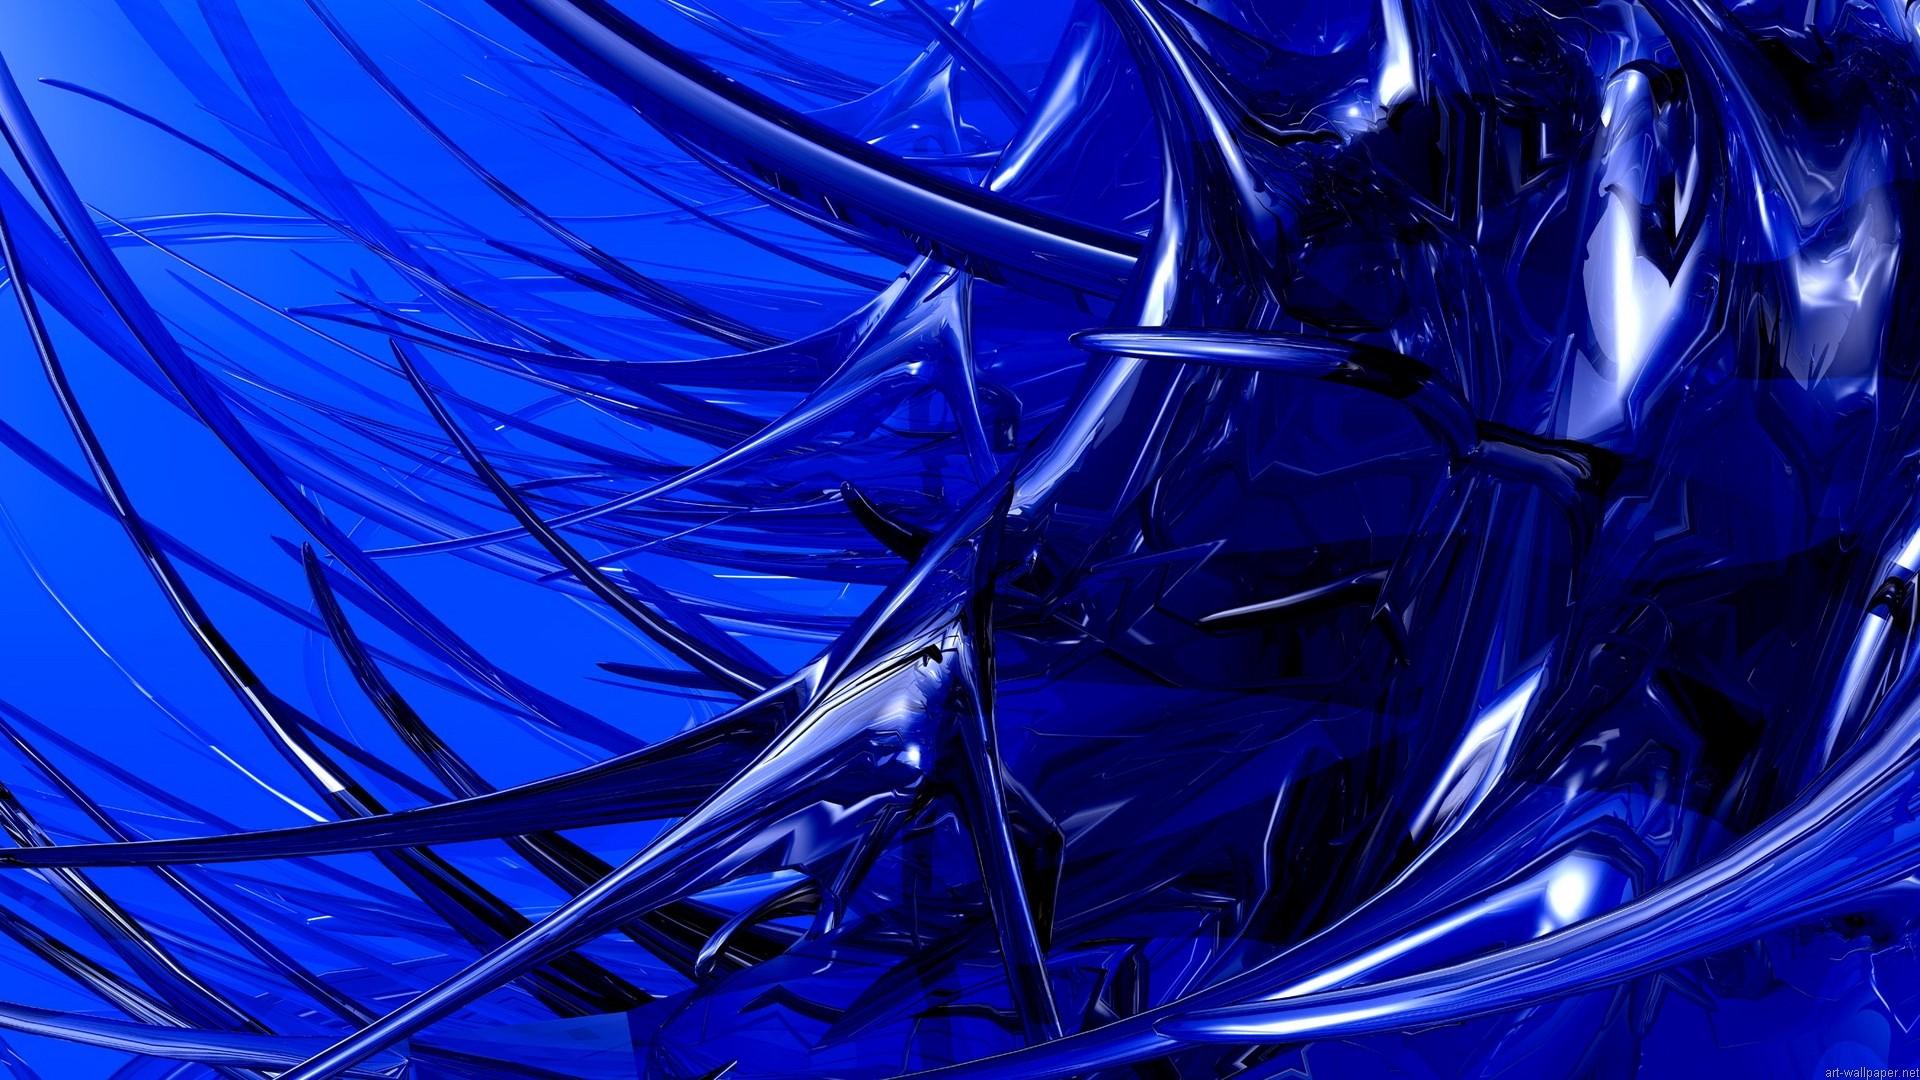 Hd Wallpaper 1920x1080 Black Blue: HD Wallpaper 1080p Blue